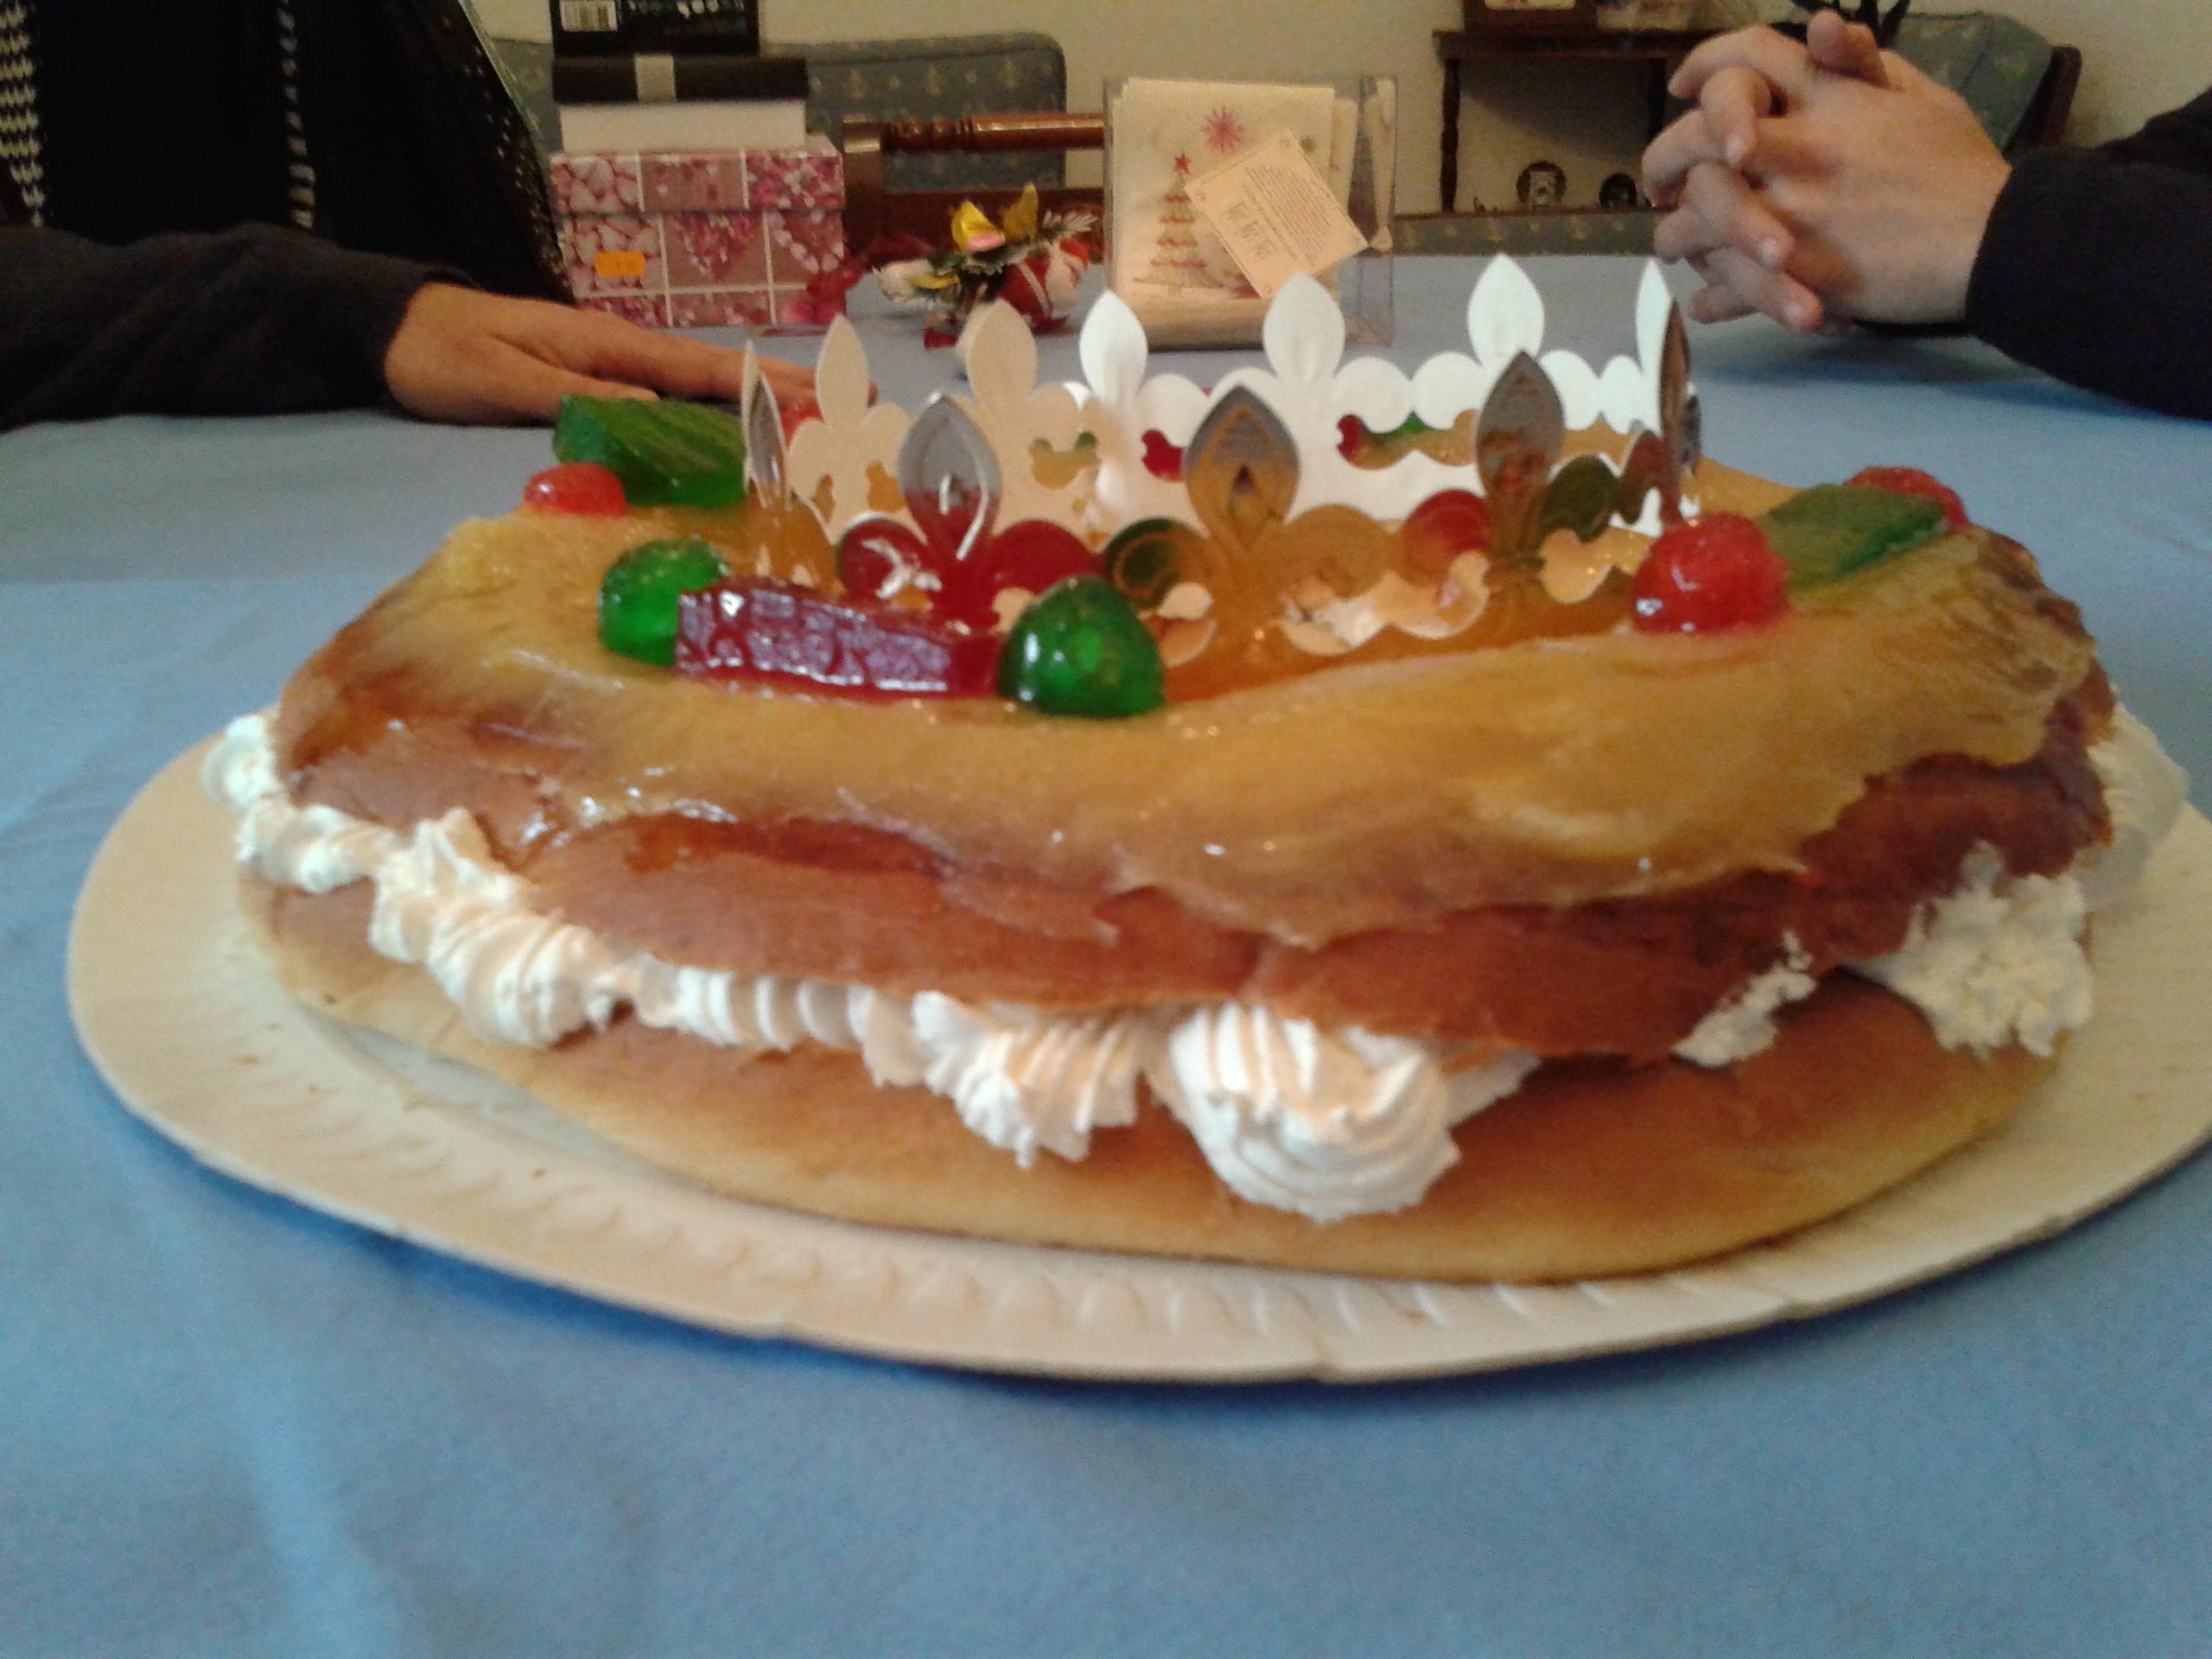 Celebrating Los Reyes Magos (Three Kings)